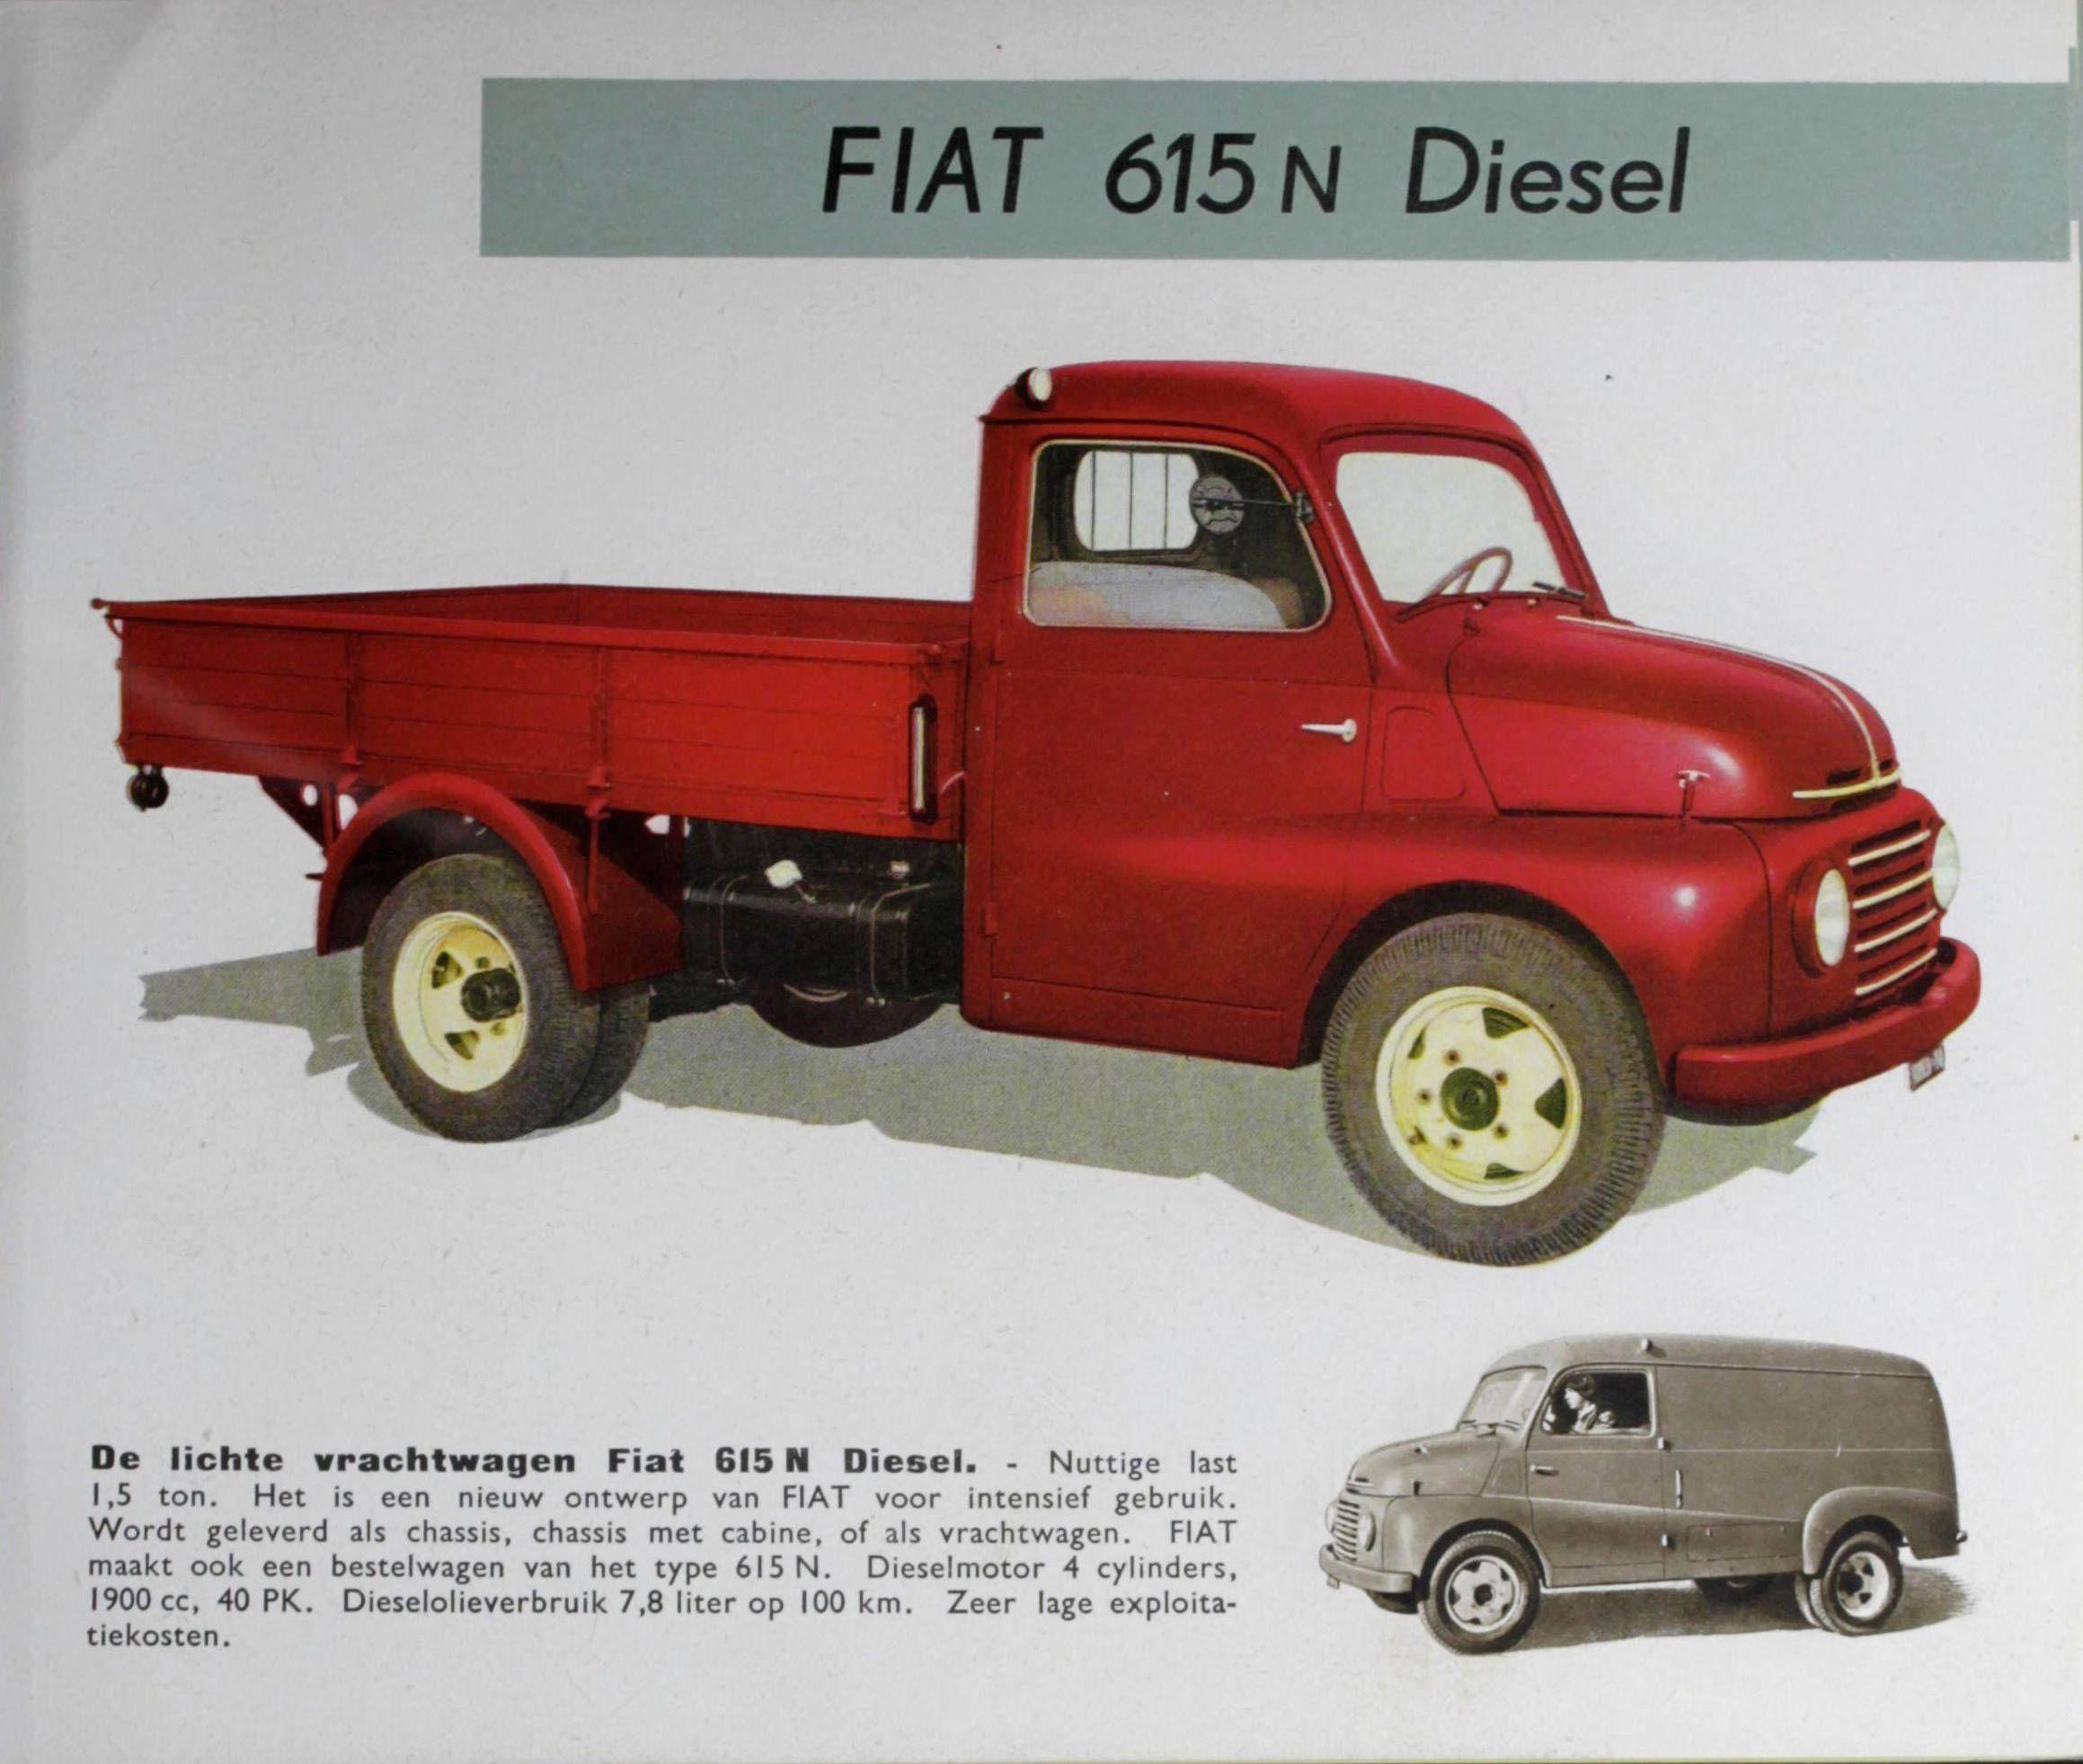 1951-1962 Fiat 615 N | Classic Vintage Trucks | Pinterest | Fiat and ...